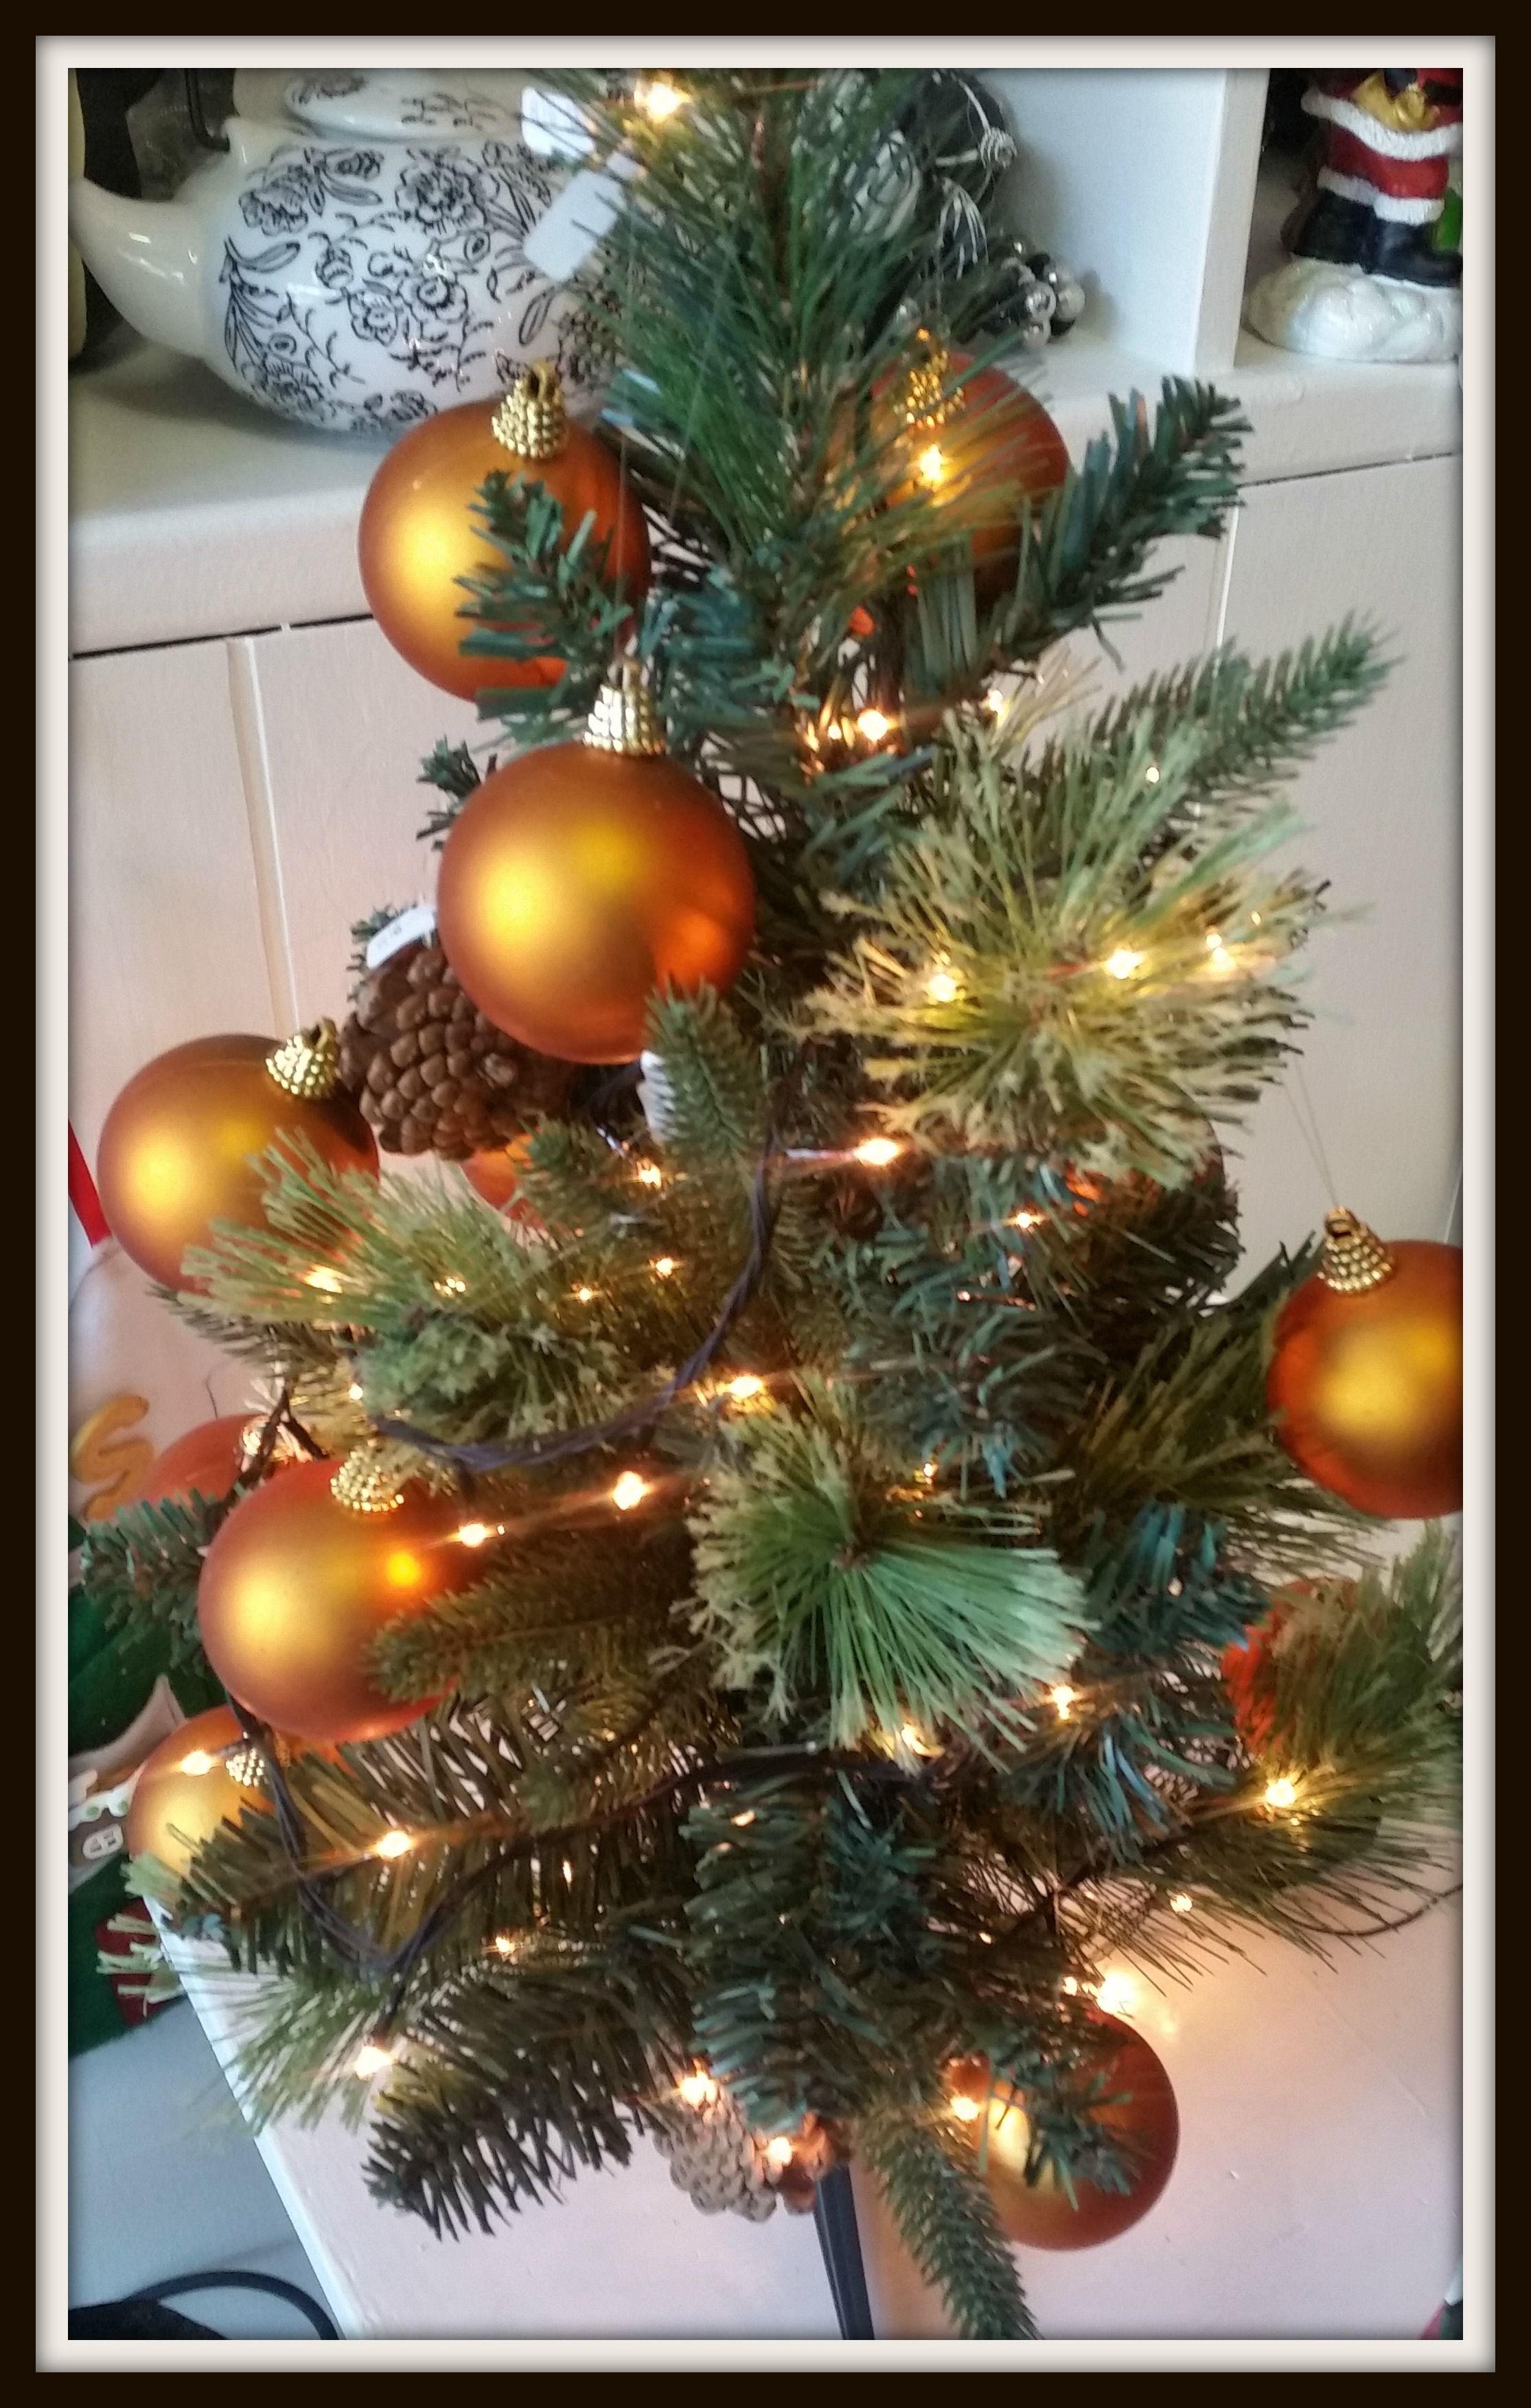 600 Mm Artificial Christmas Tree Table Top Tree In Cherylin Creations Christmas Shop Www Cherylincreations Co Za Christmas Wreaths Holiday Decor Christmas